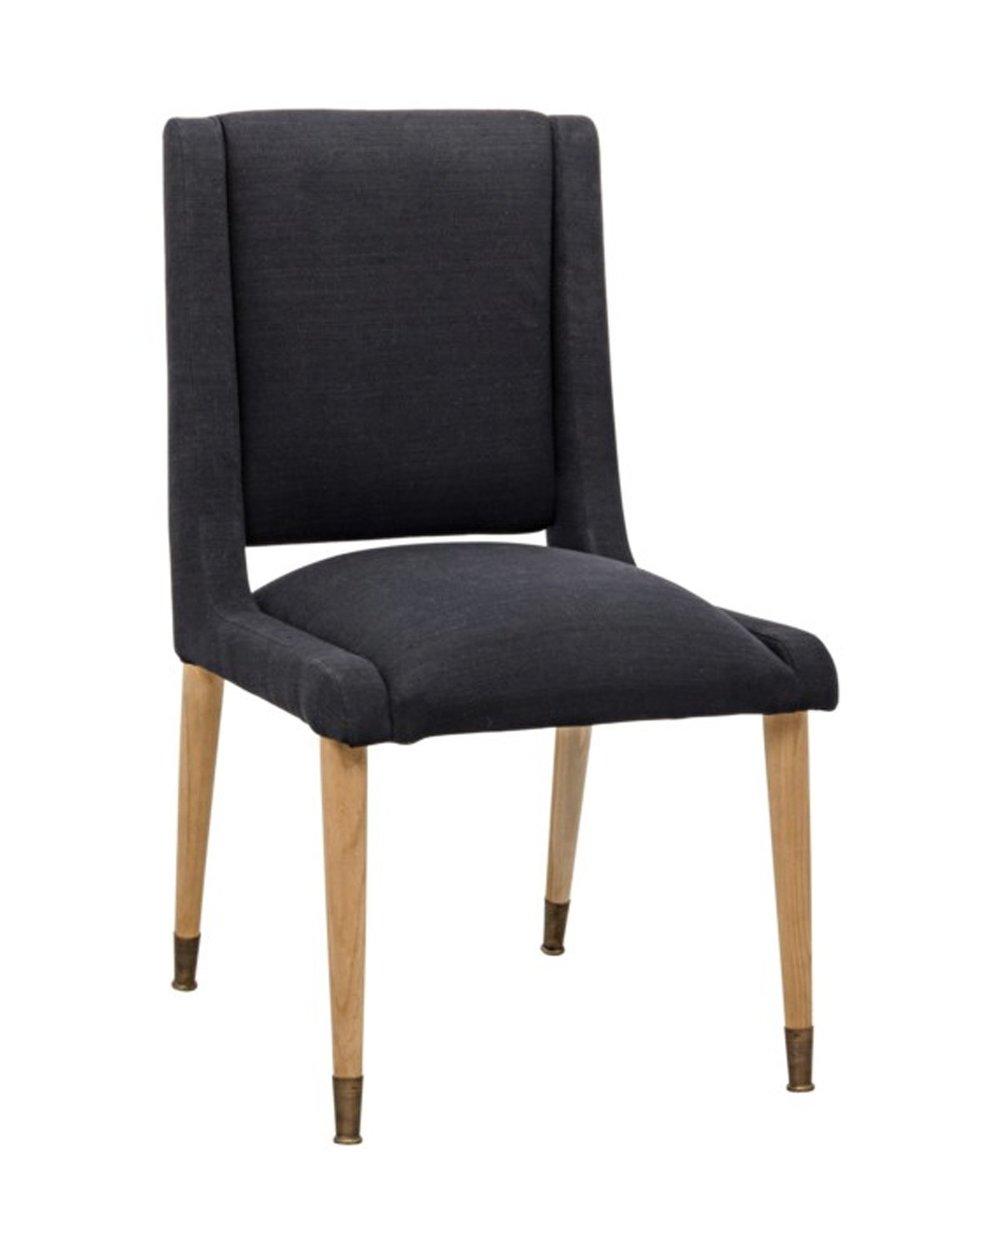 Roscoe_Dining_Chair_1.jpg